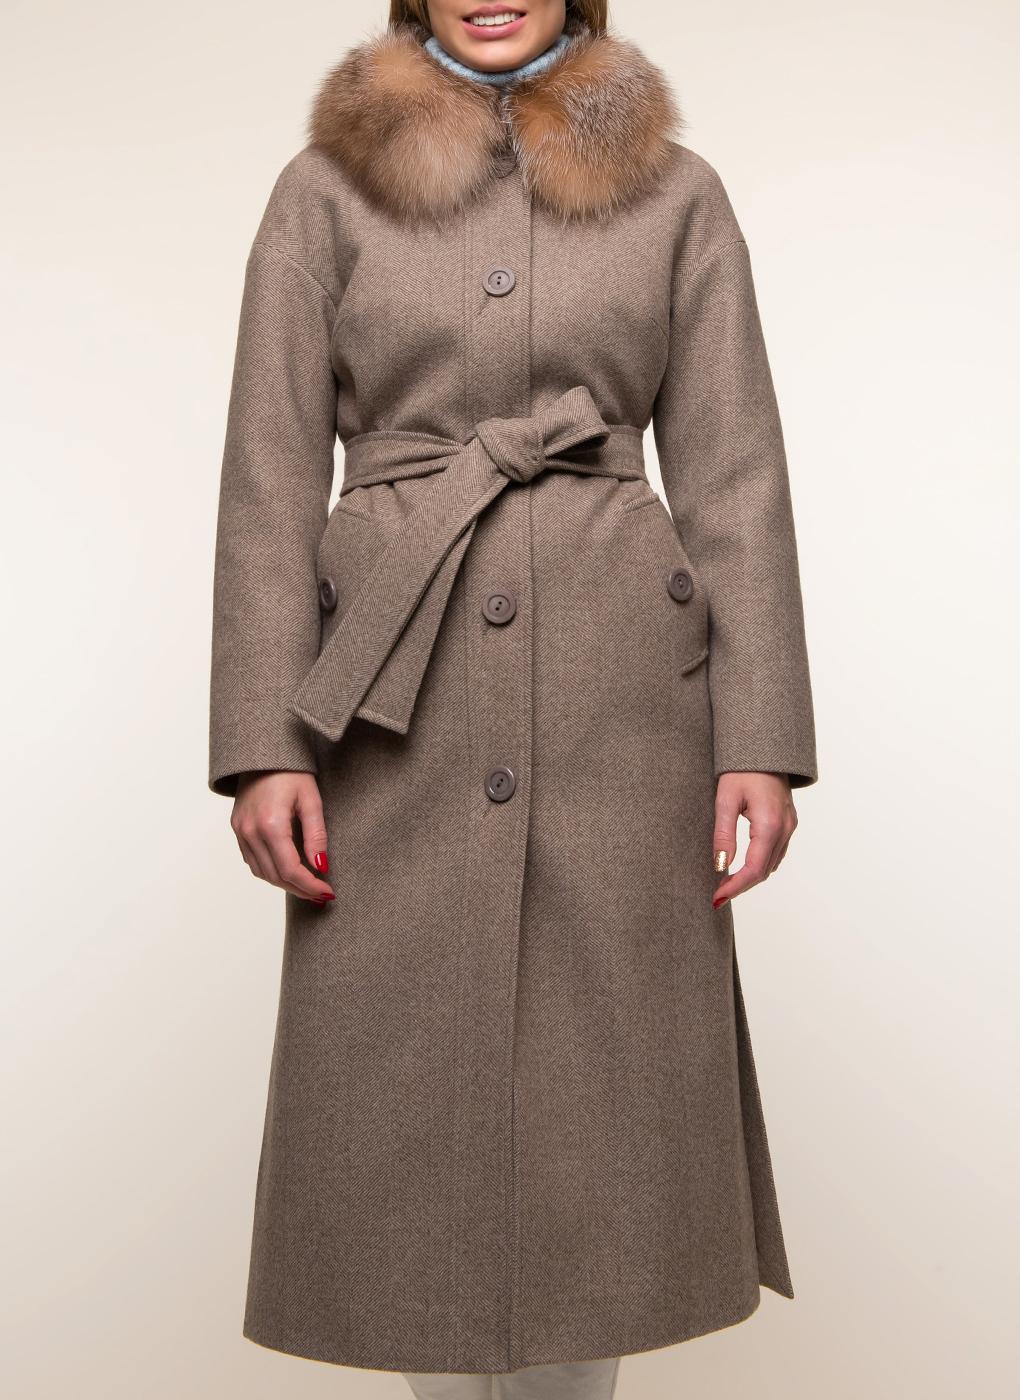 Пальто полушерстяное 37, Sezalto фото